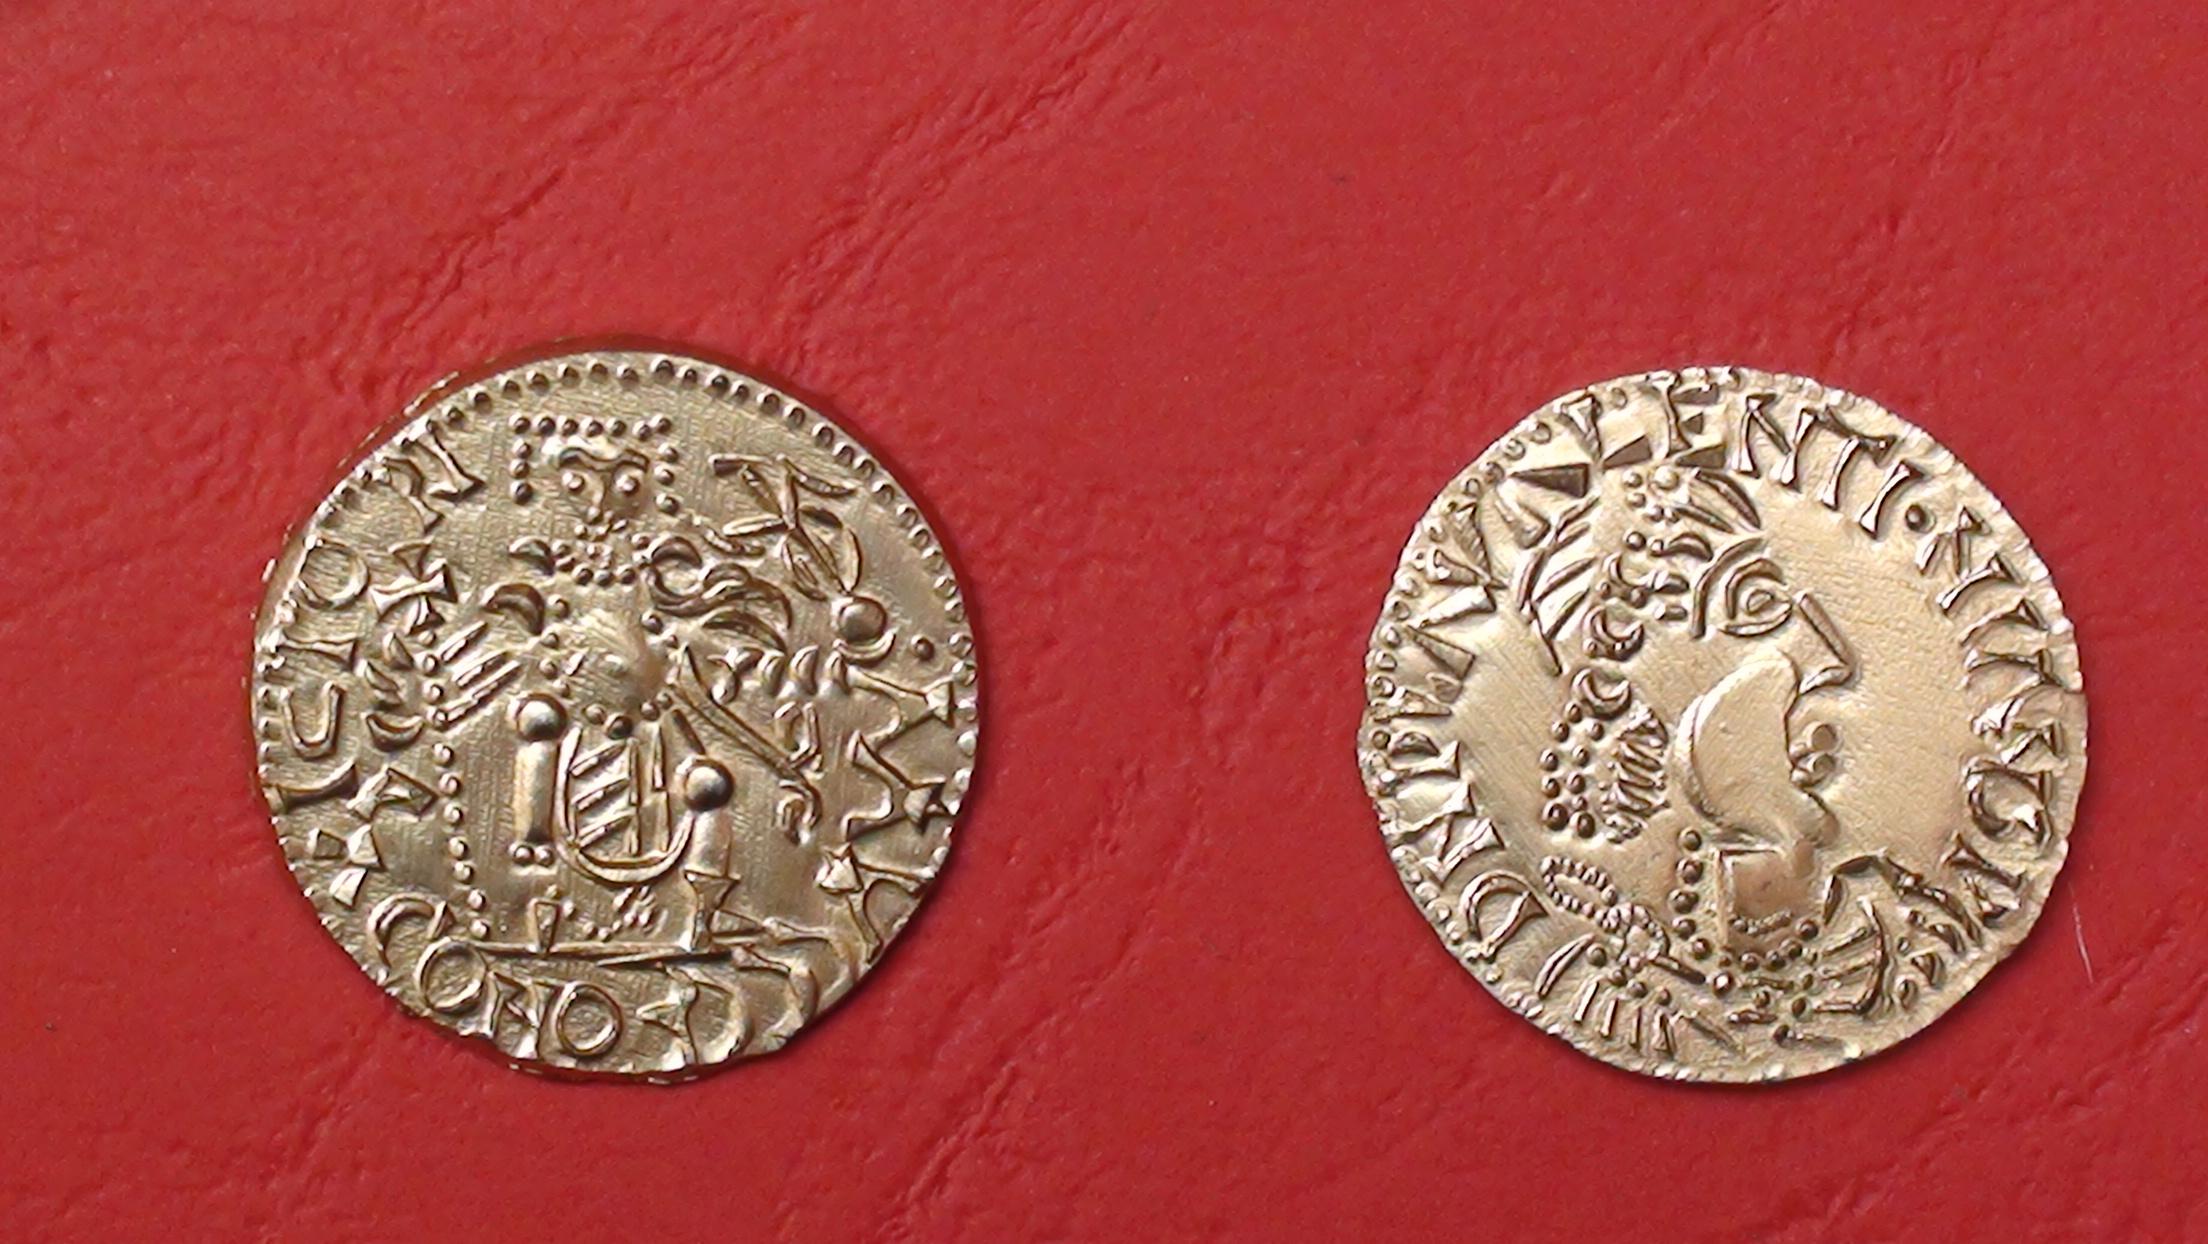 Solidus - Monnaie wisigoth